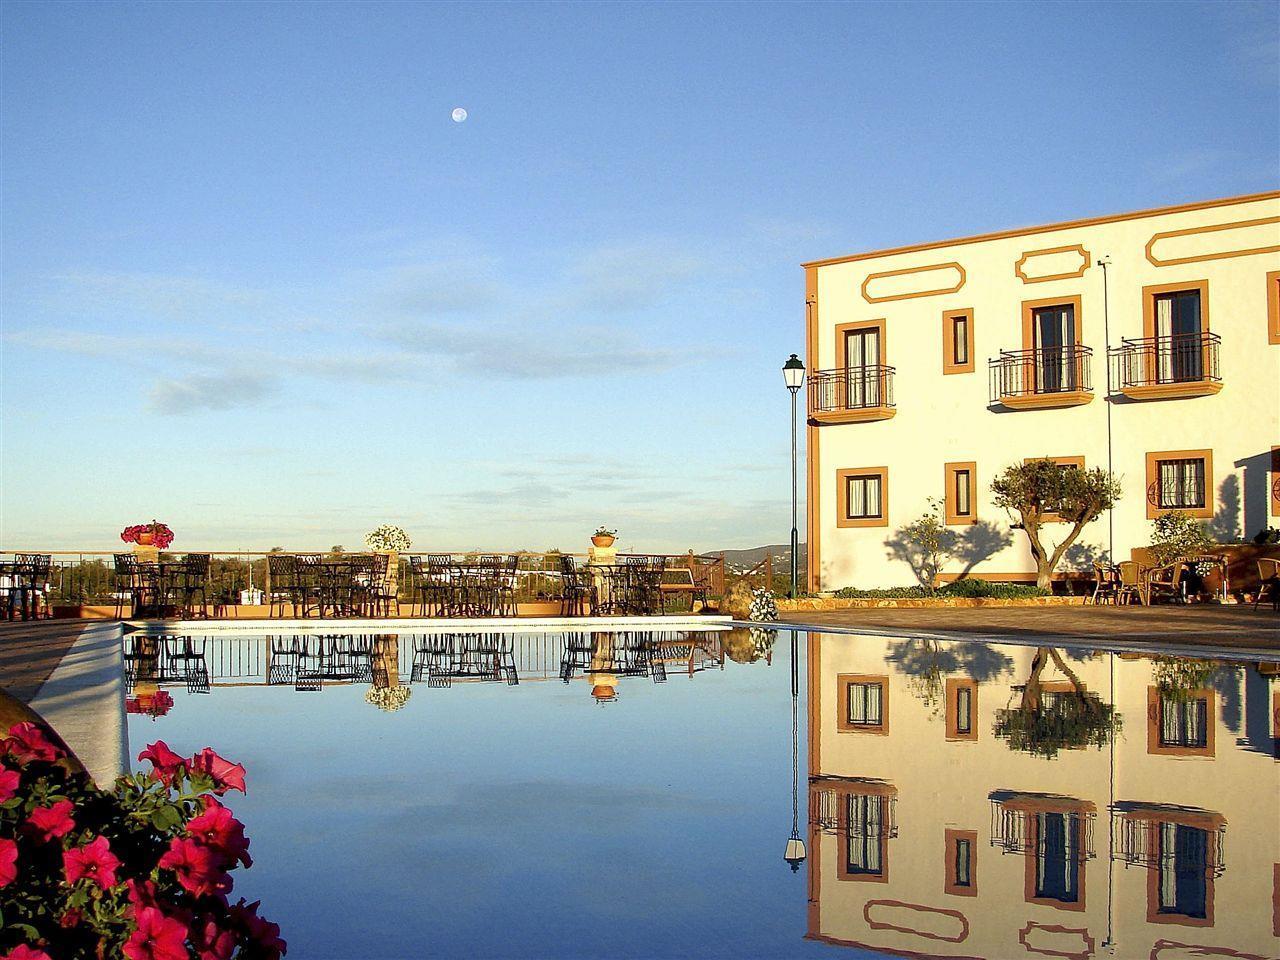 Einfamilienhaus für Verkauf beim Detached house, 22 bedrooms, for Sale Olhao, Algarve Portugal